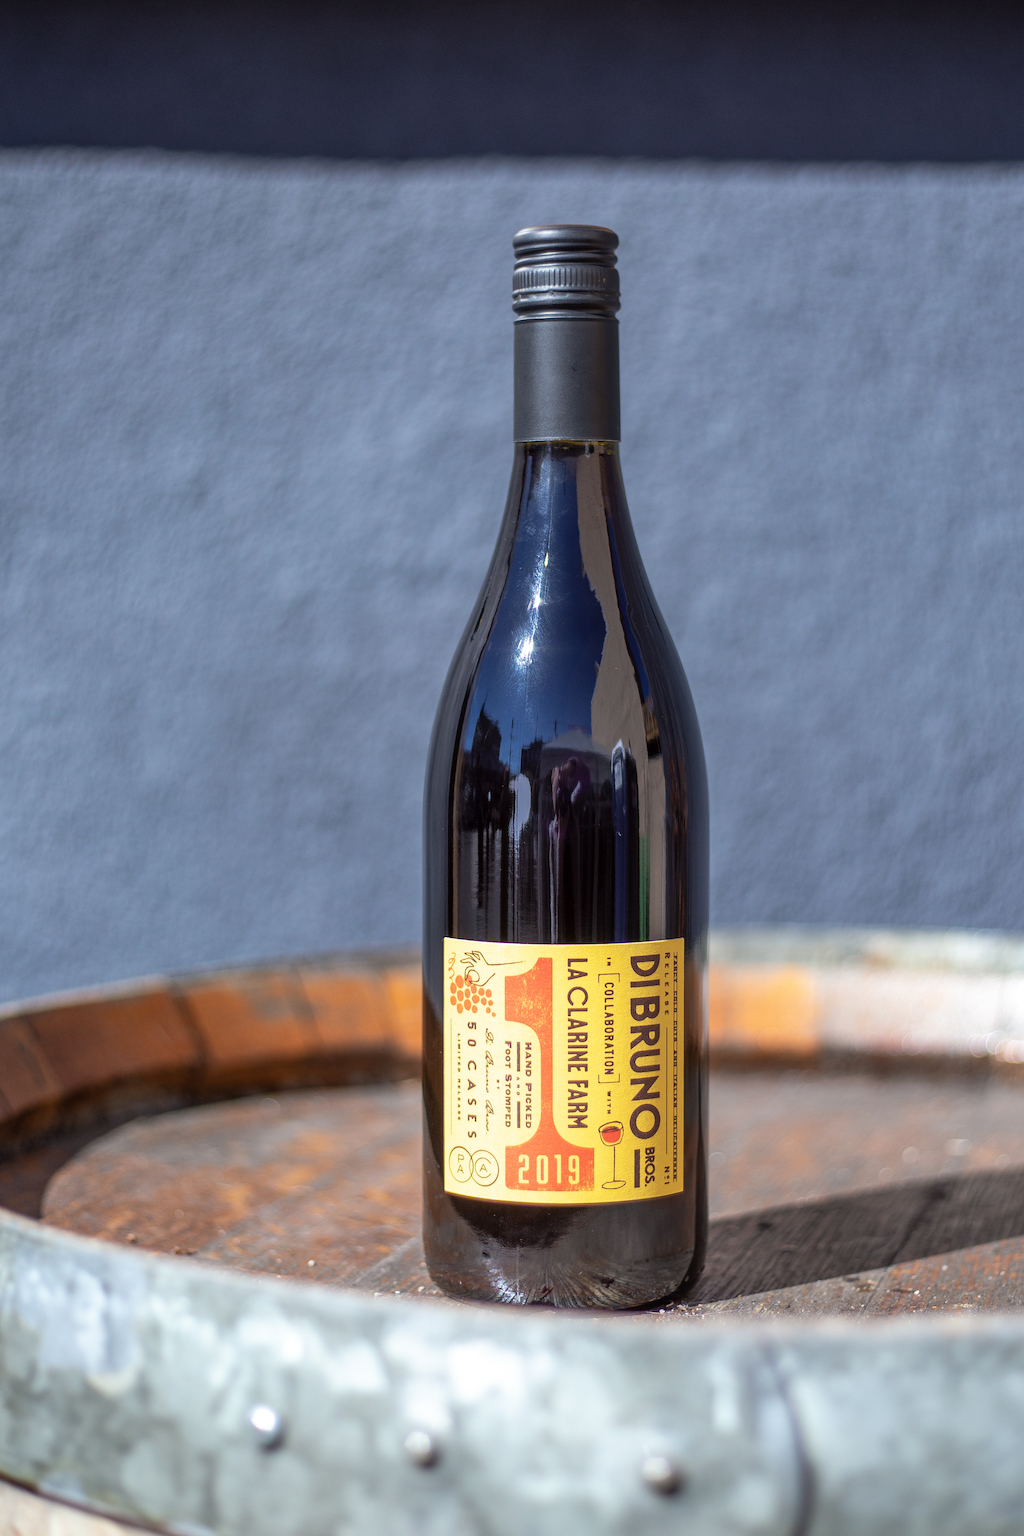 dibruno bros. wine